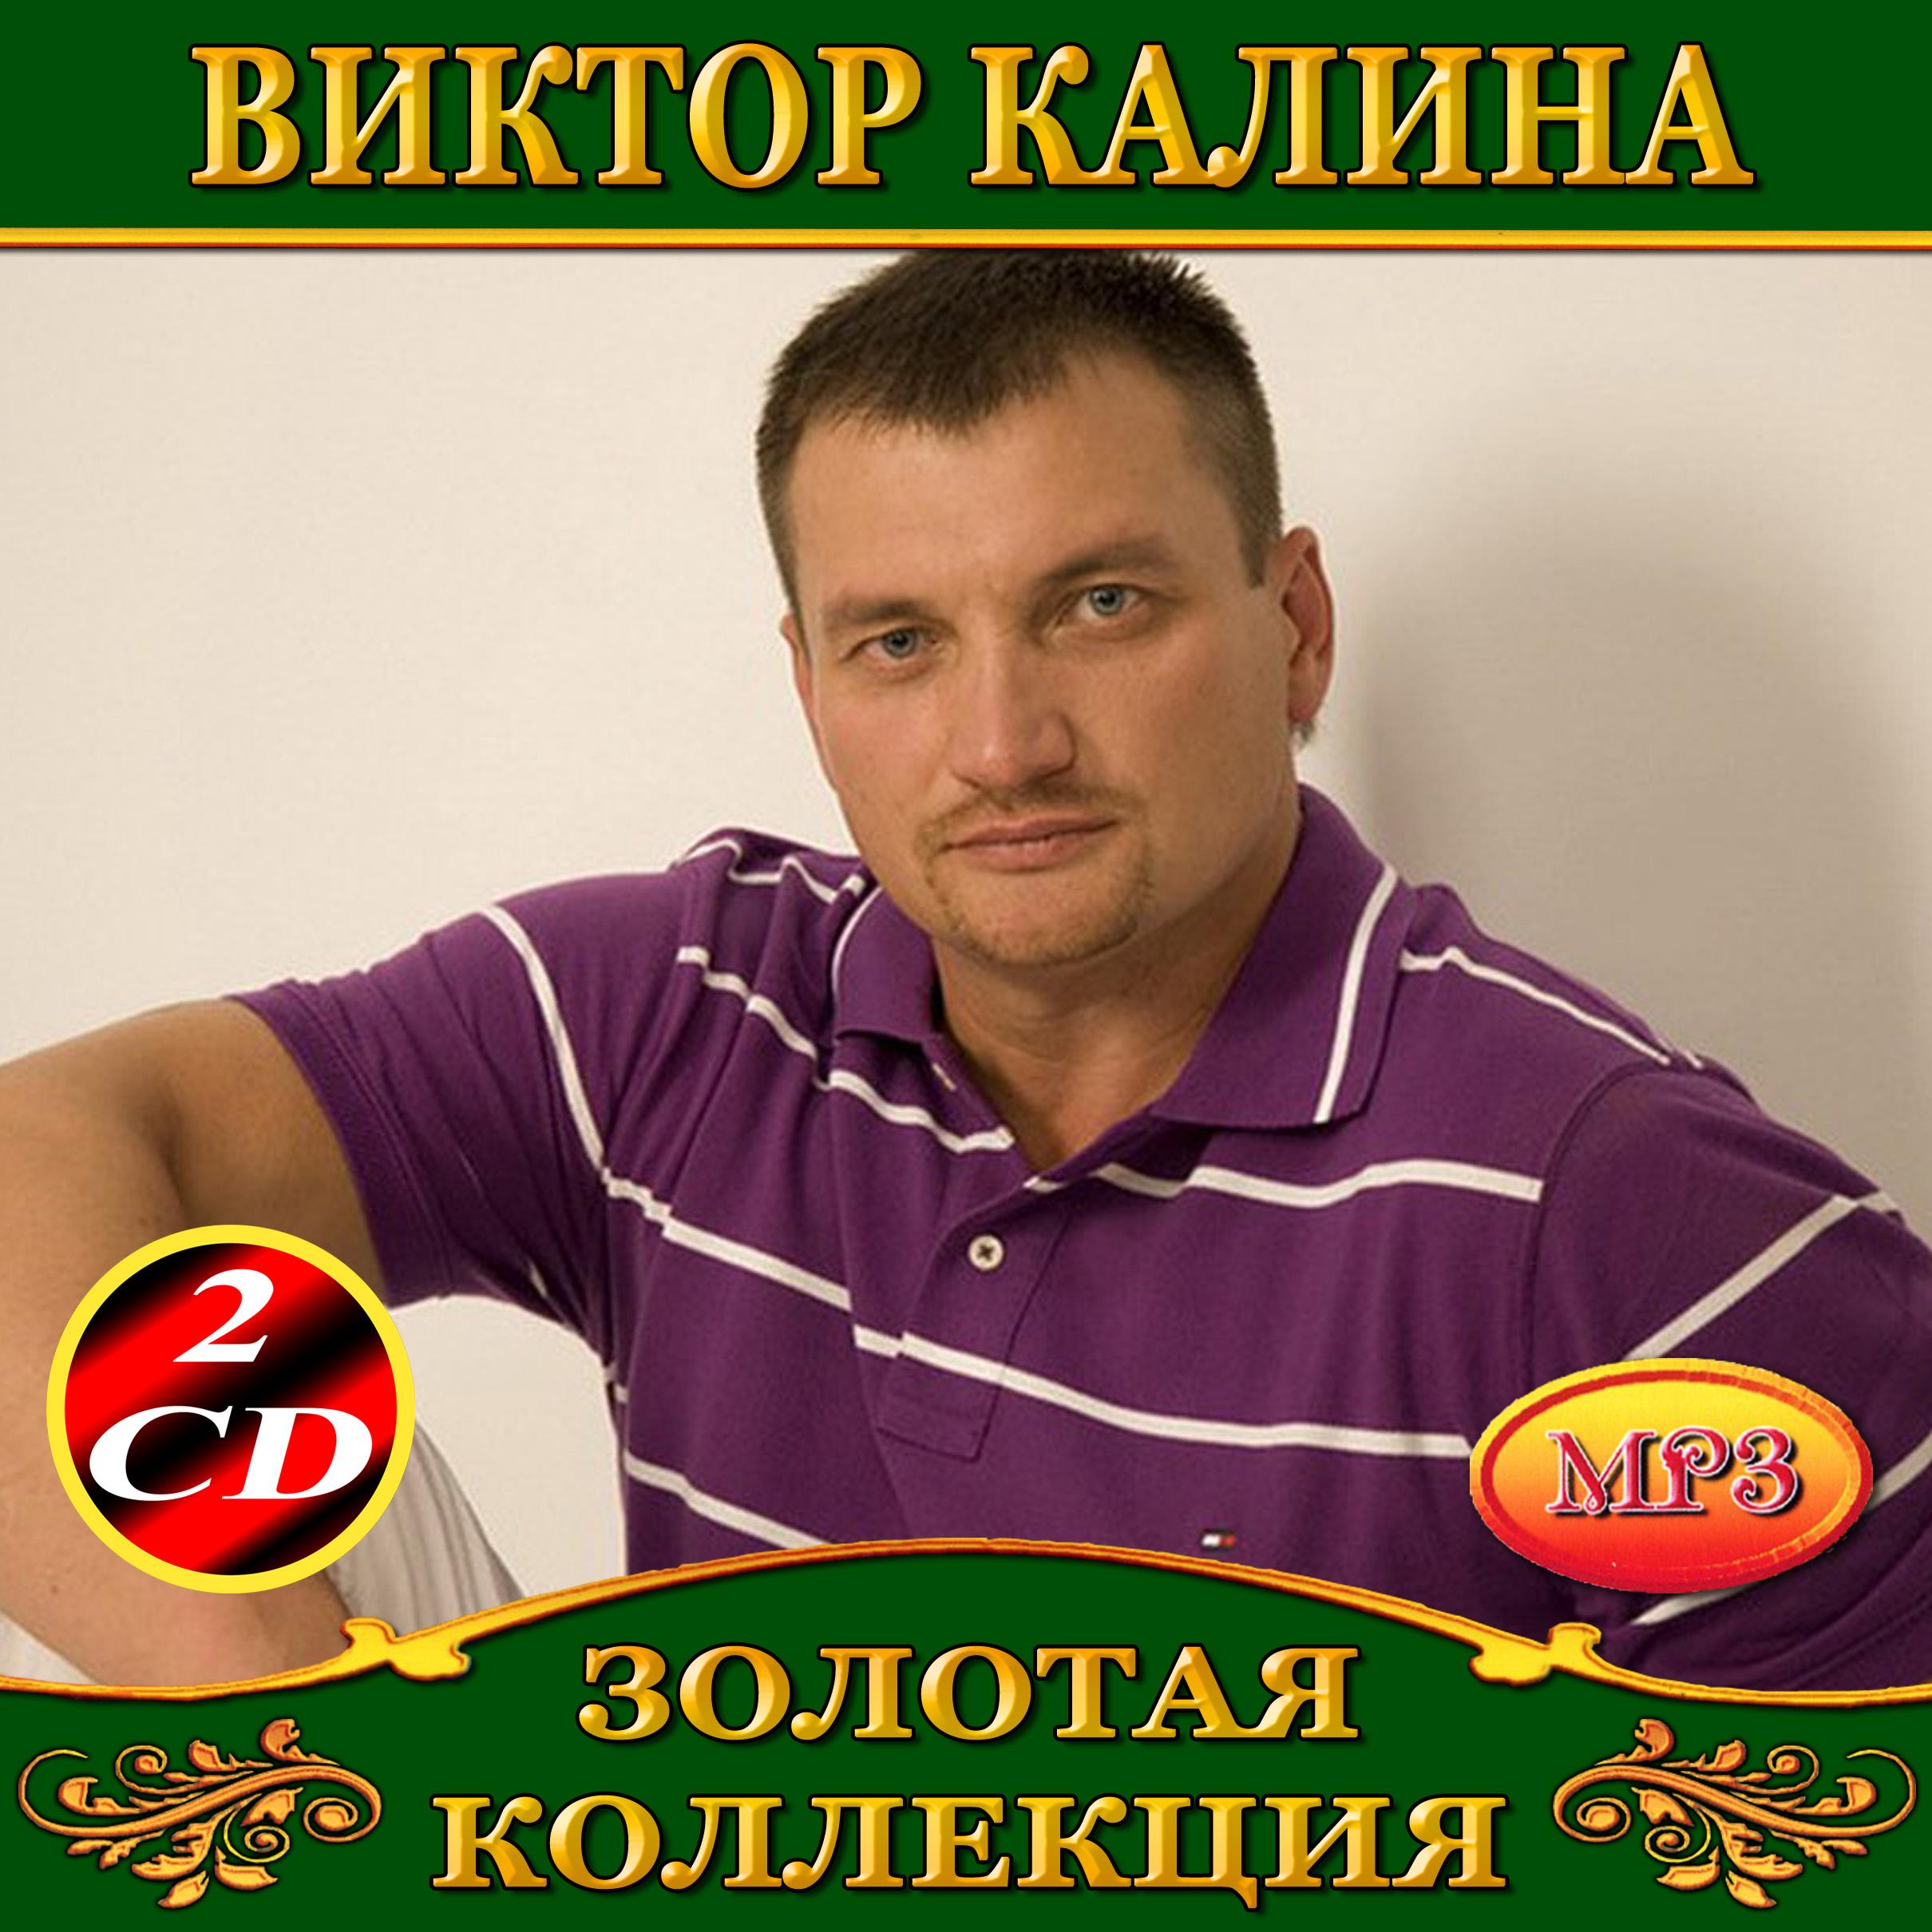 Виктор Калина 2cd [mp3]